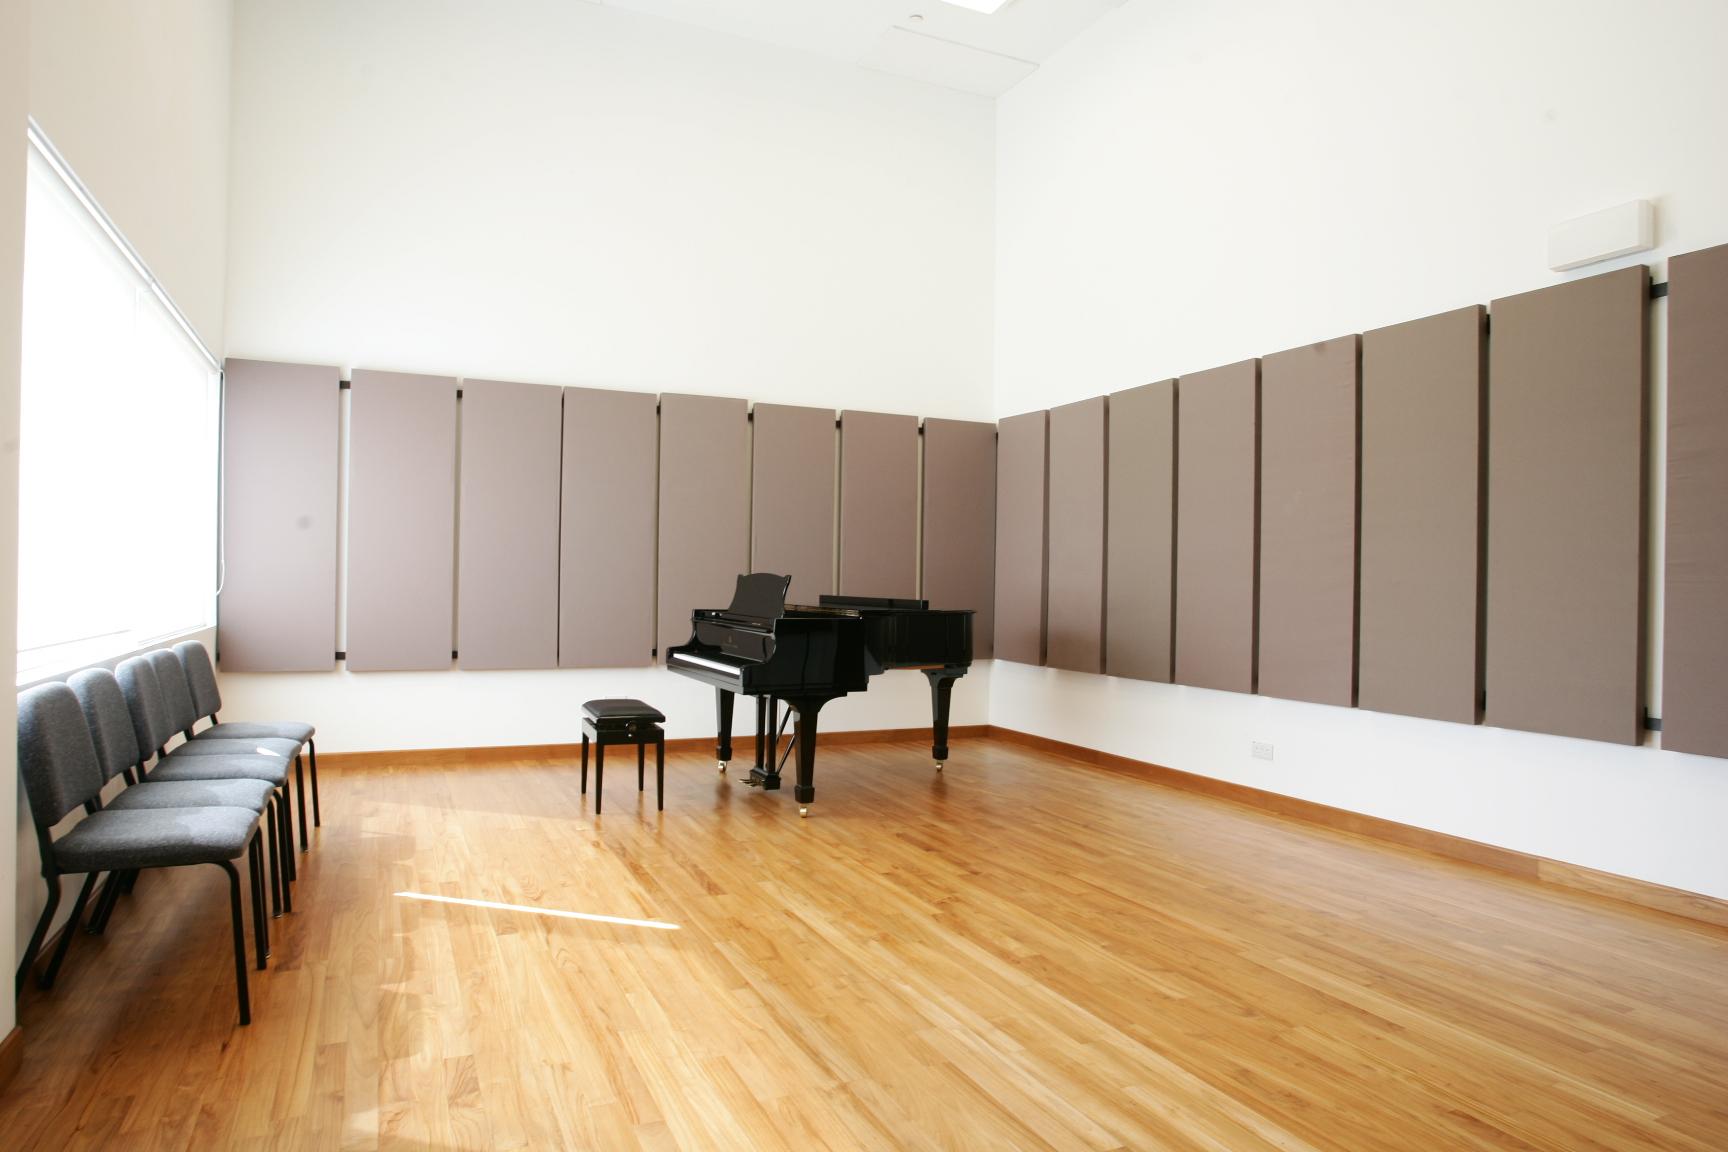 Ensemble Rooms